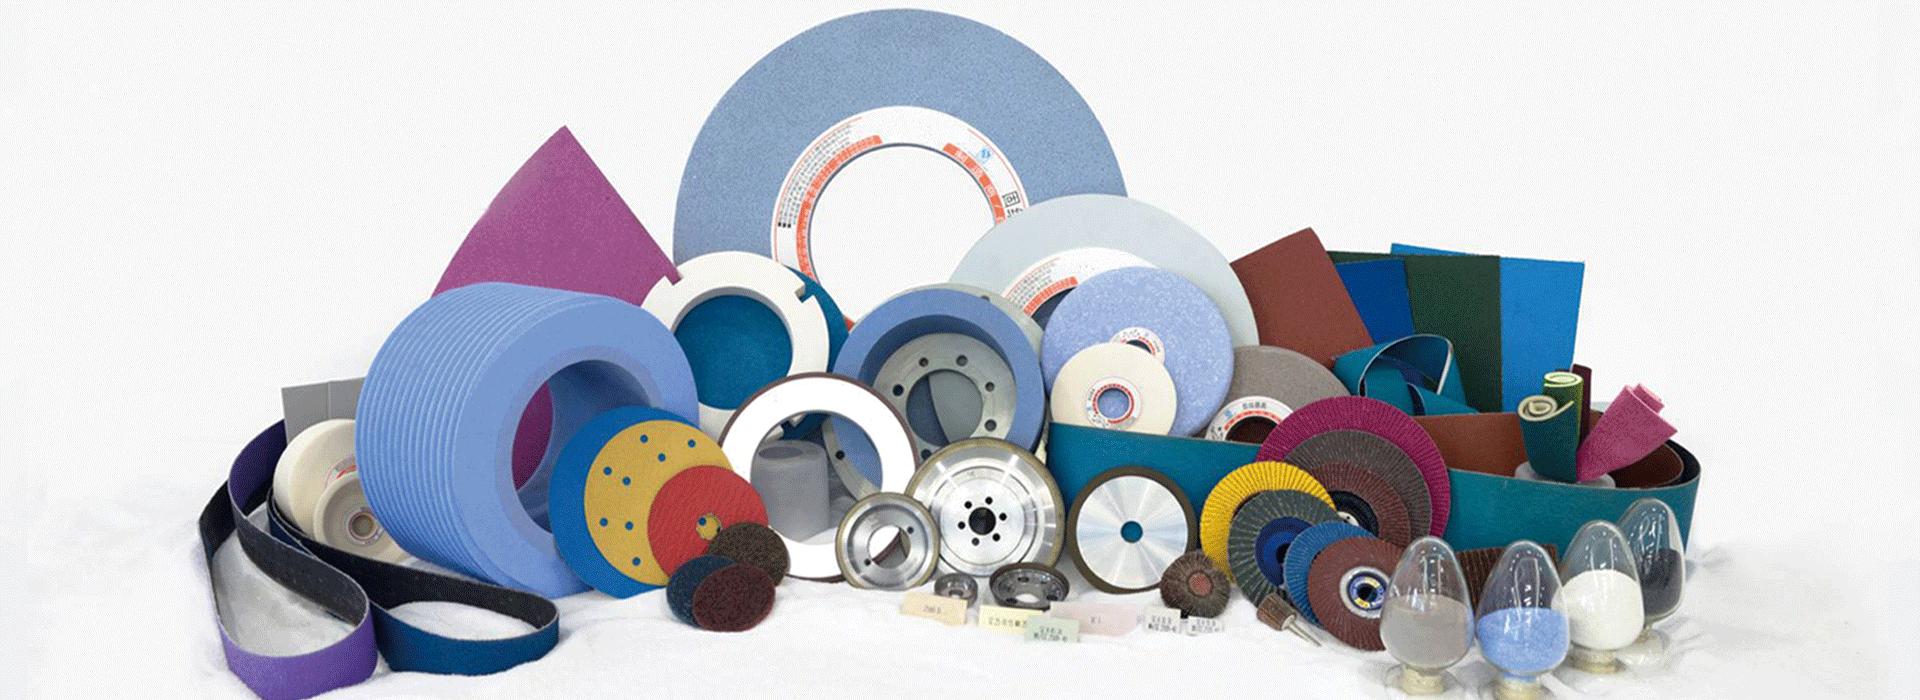 Grinding wheel factory